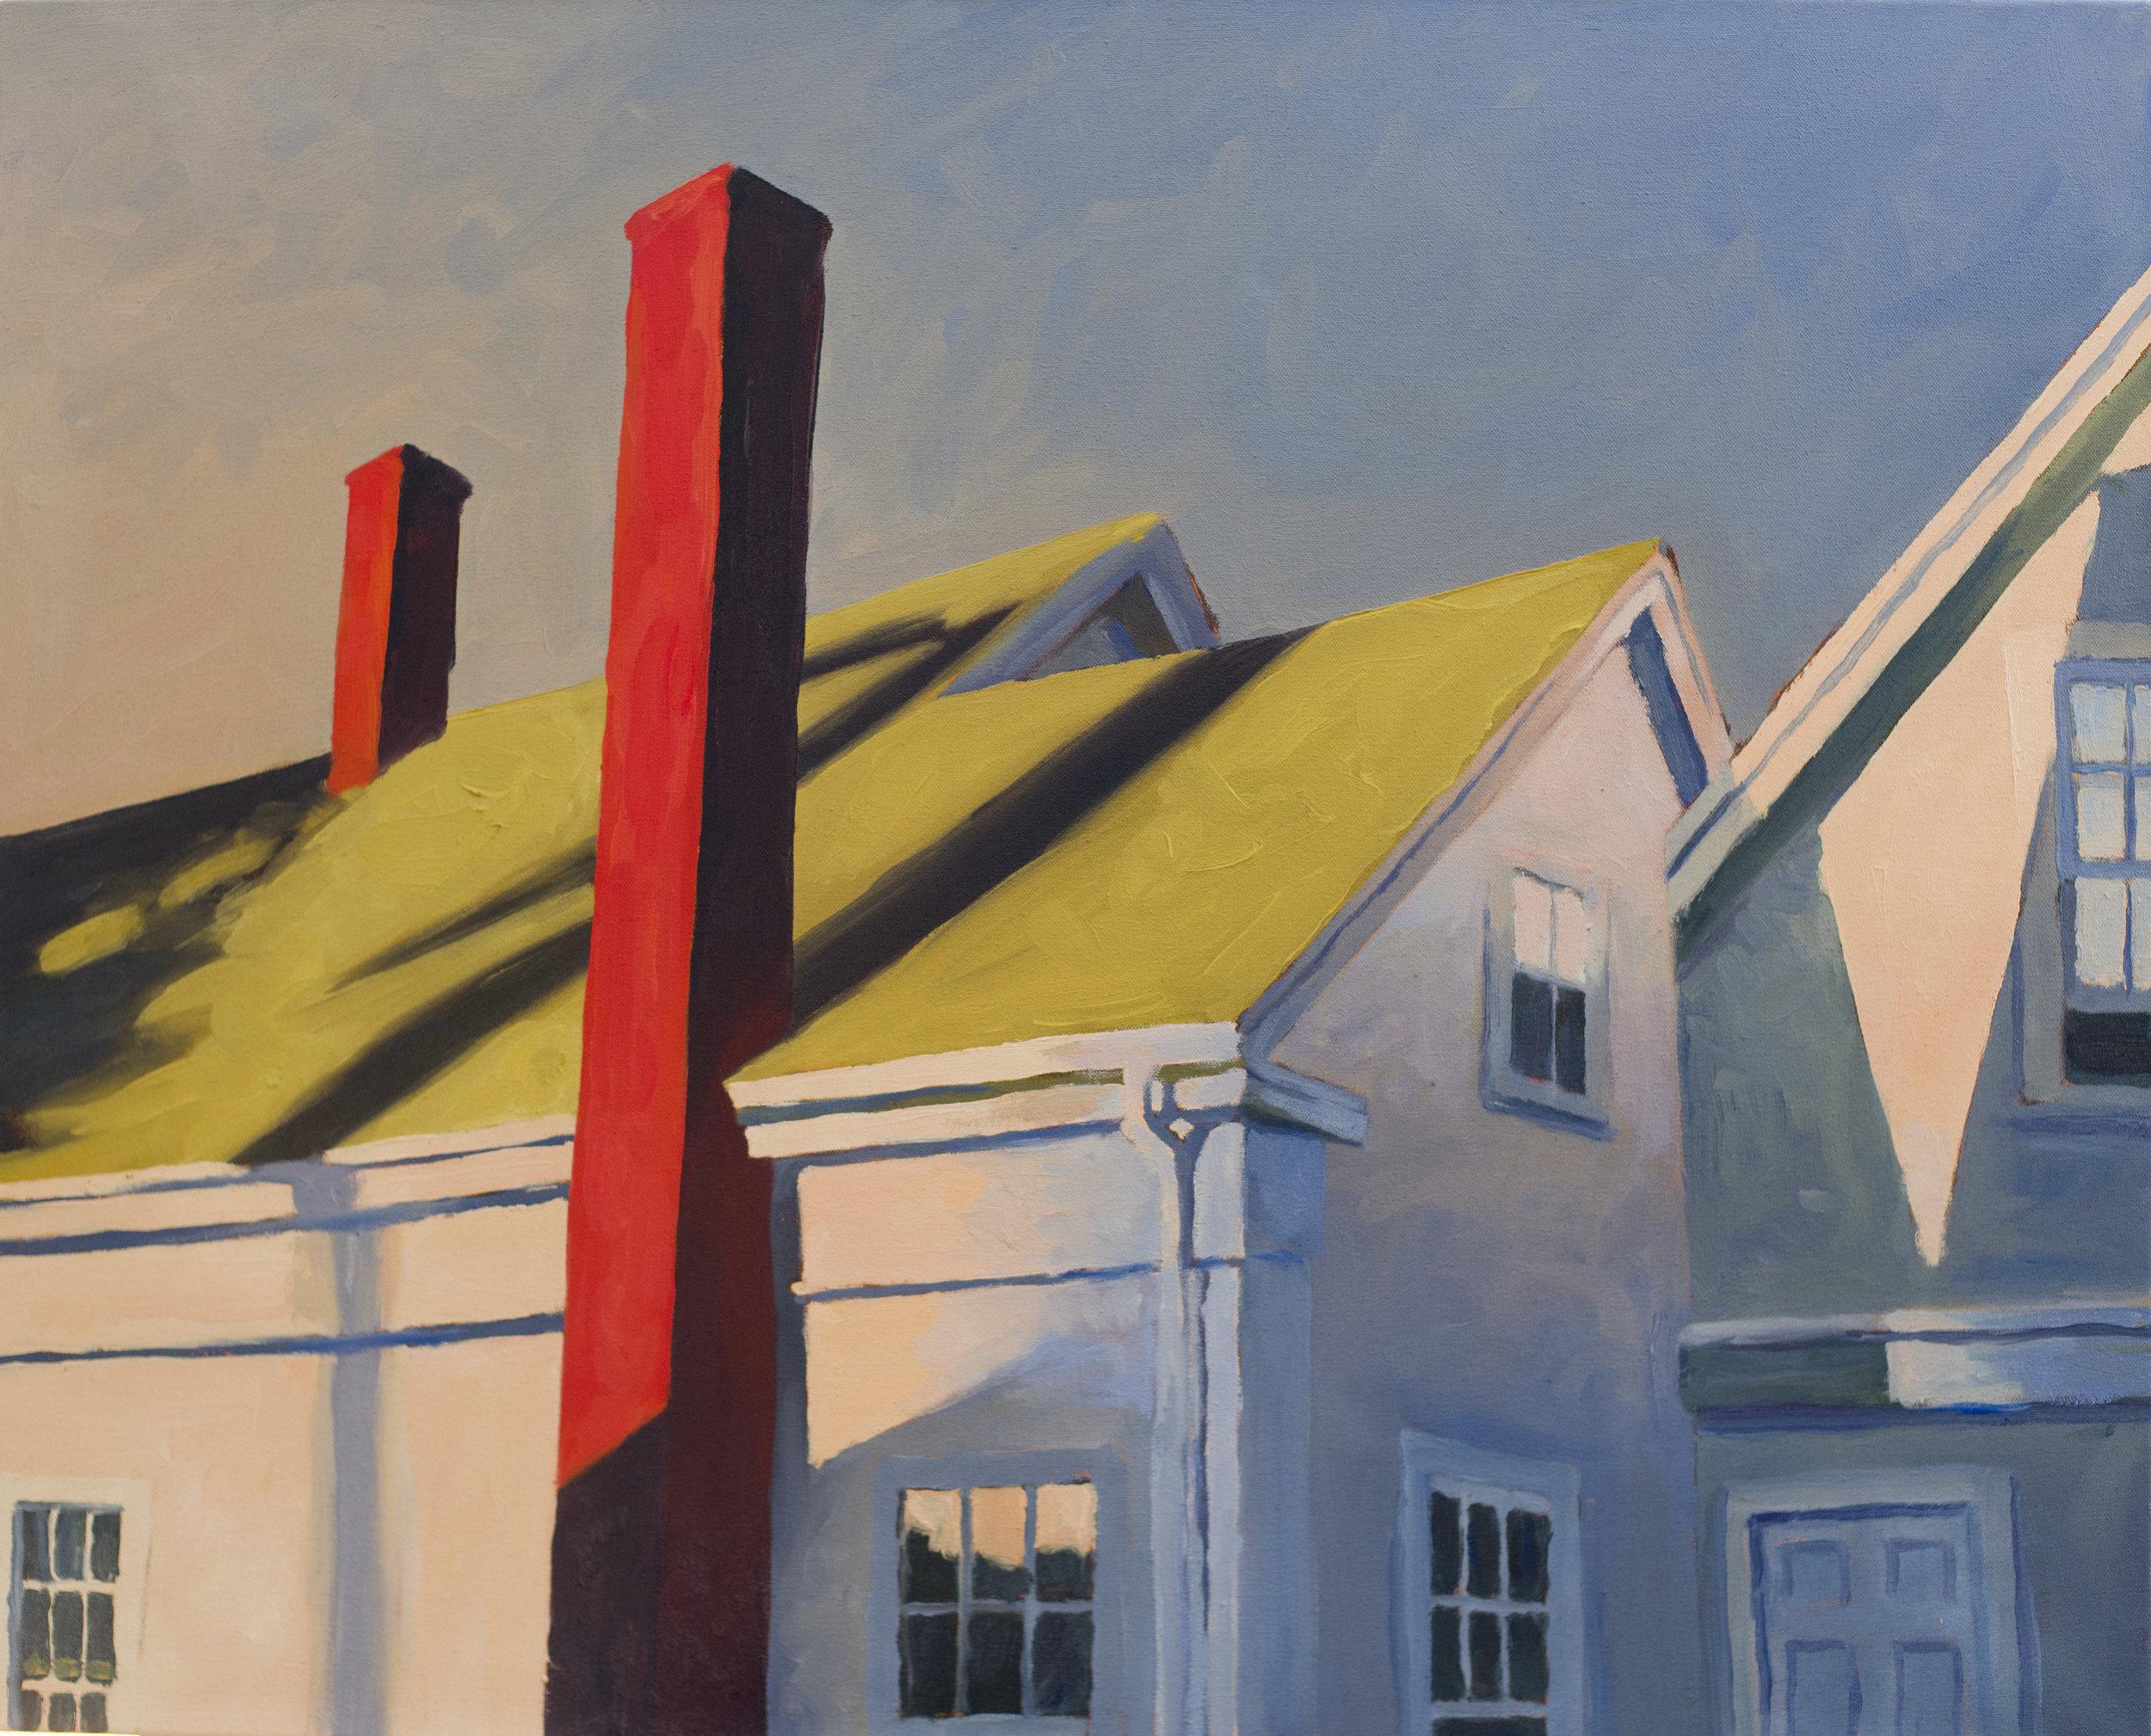 Susan's Roof #3